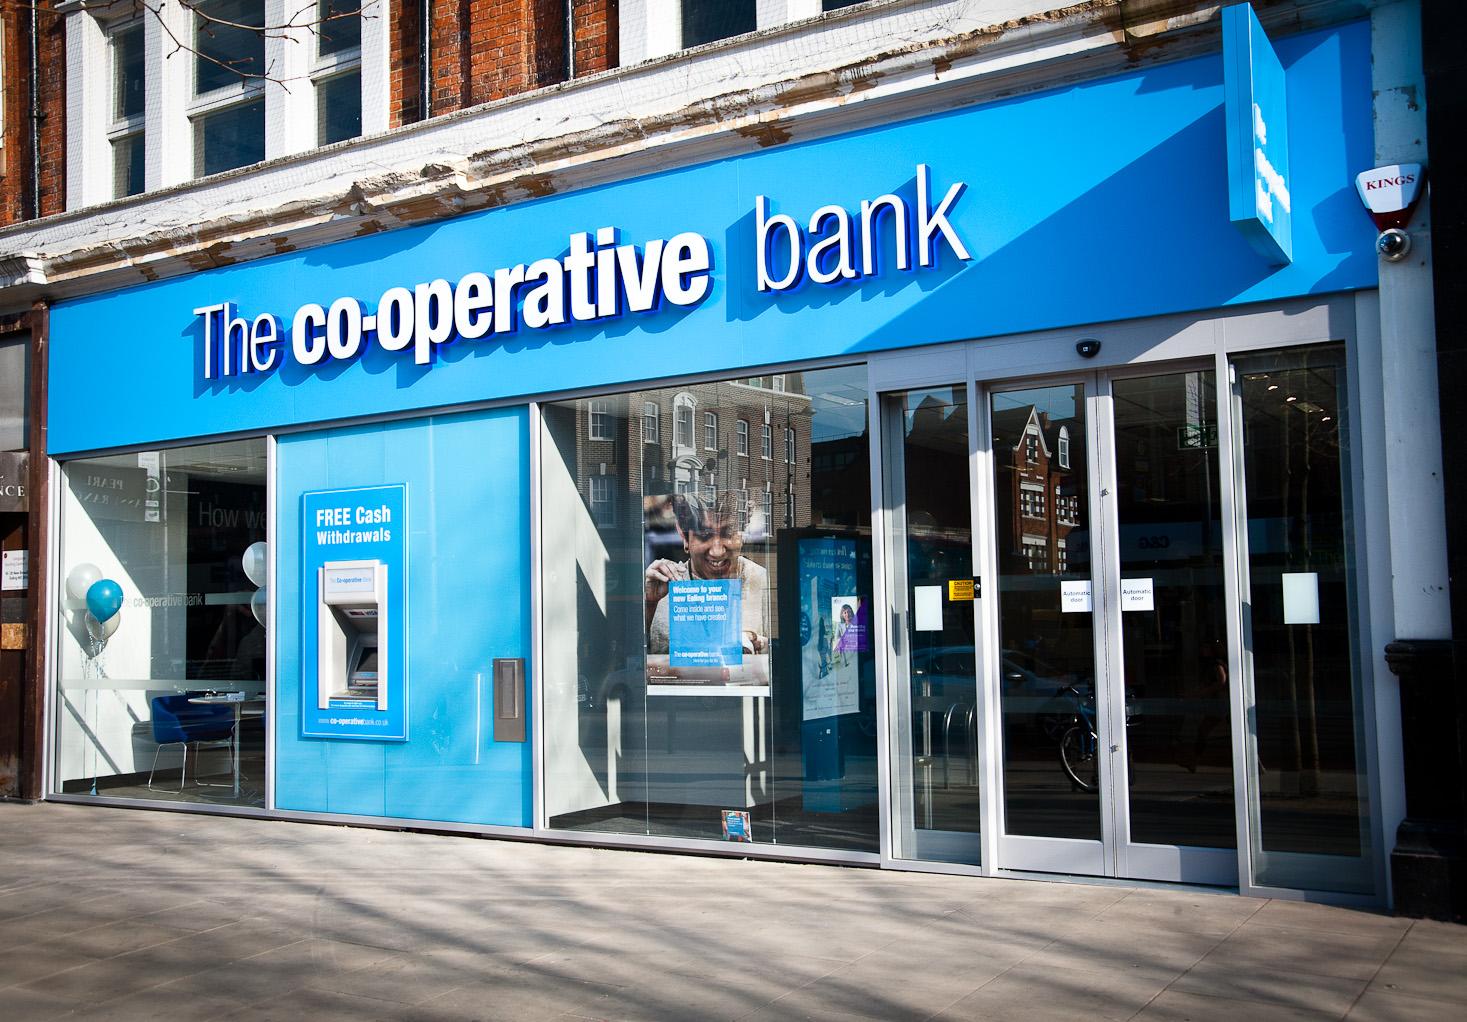 The_Co-operative_Bank_-_Ealing_(9415463884)